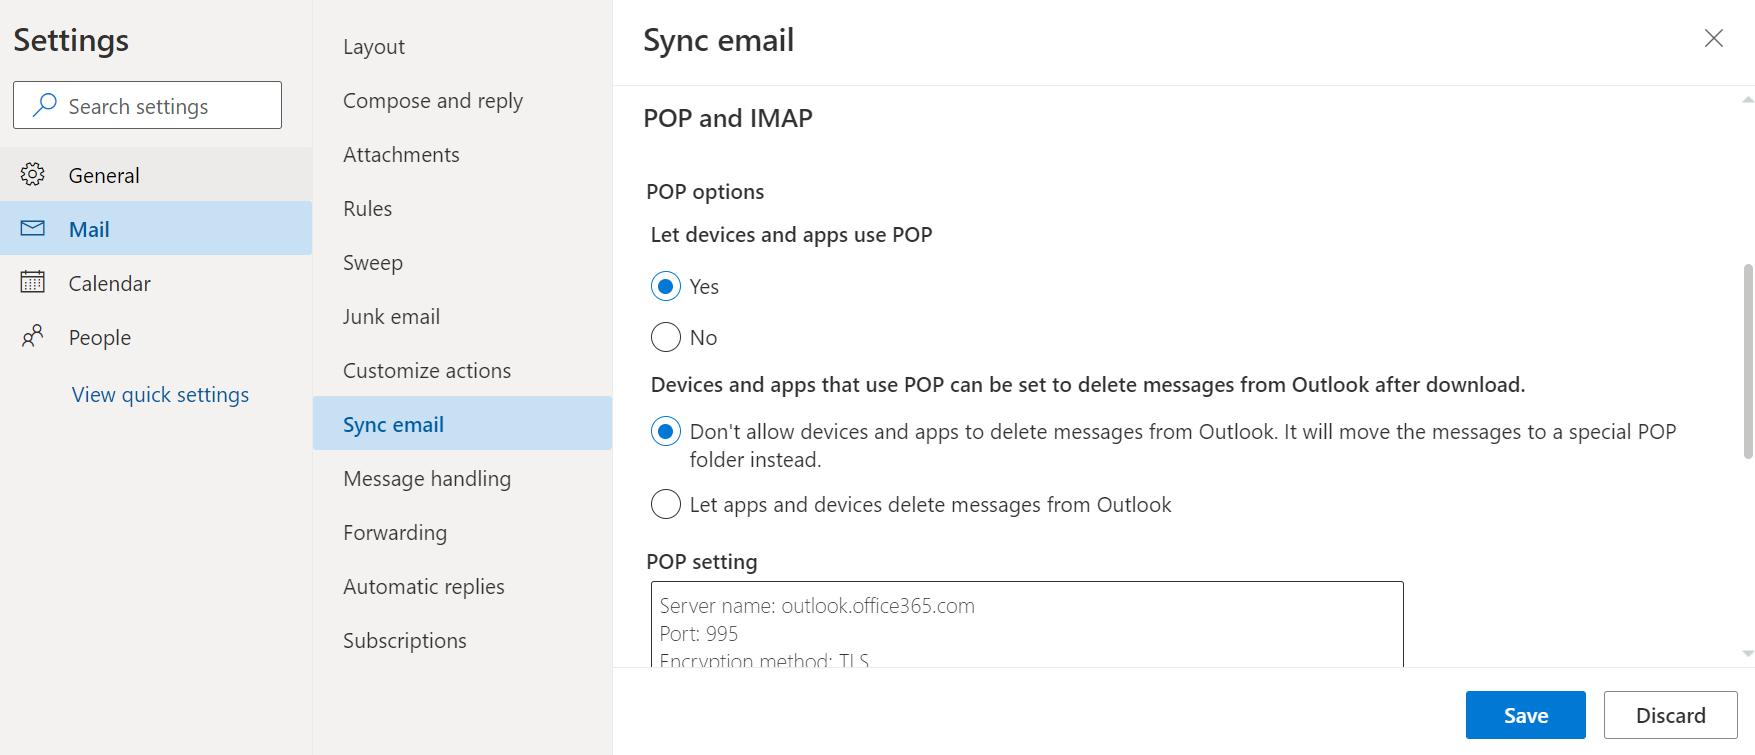 Screenshot of Outlook Sync email menu